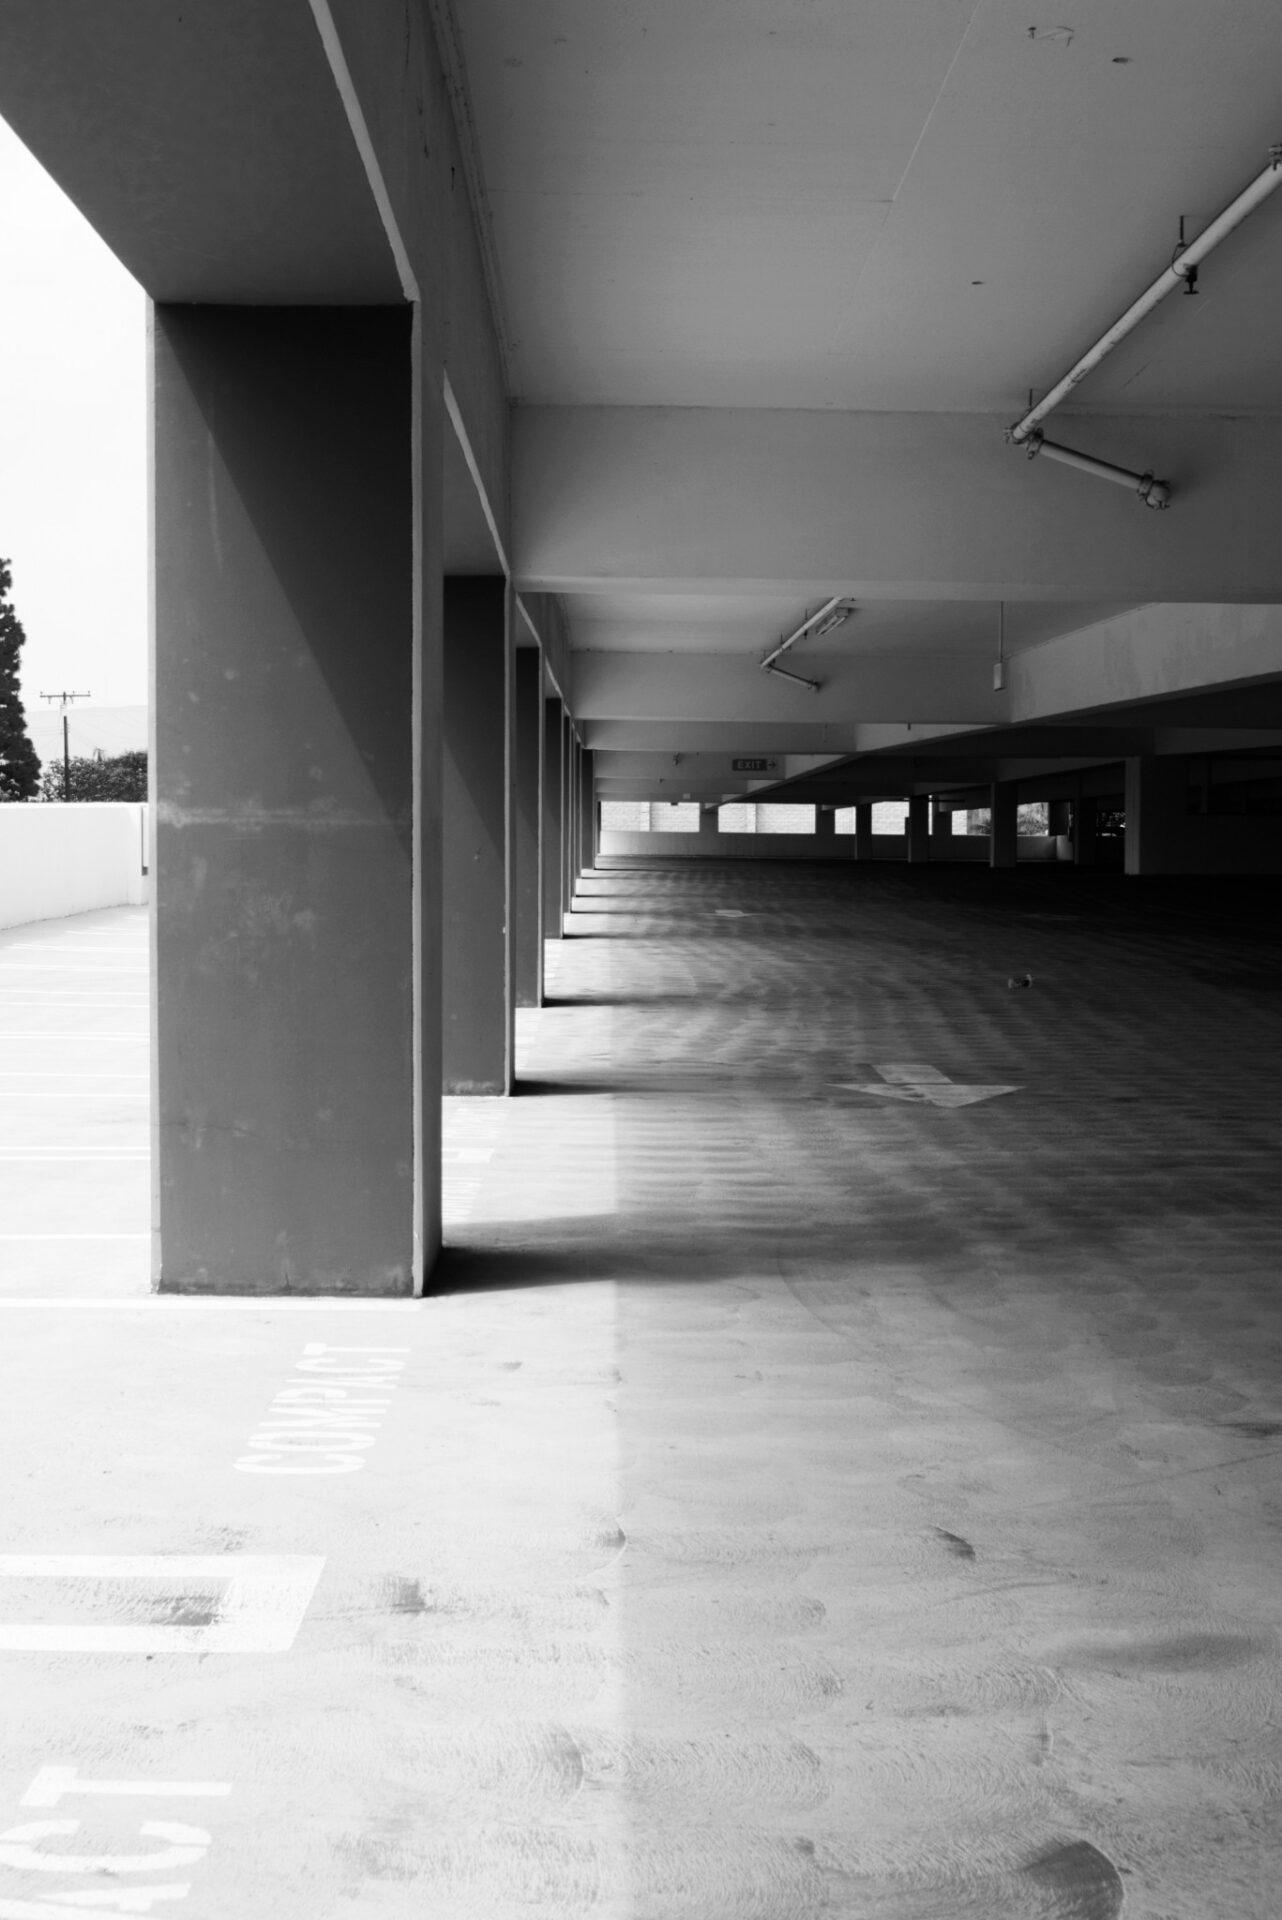 Parking structure photos at EvFree Fullerton 2